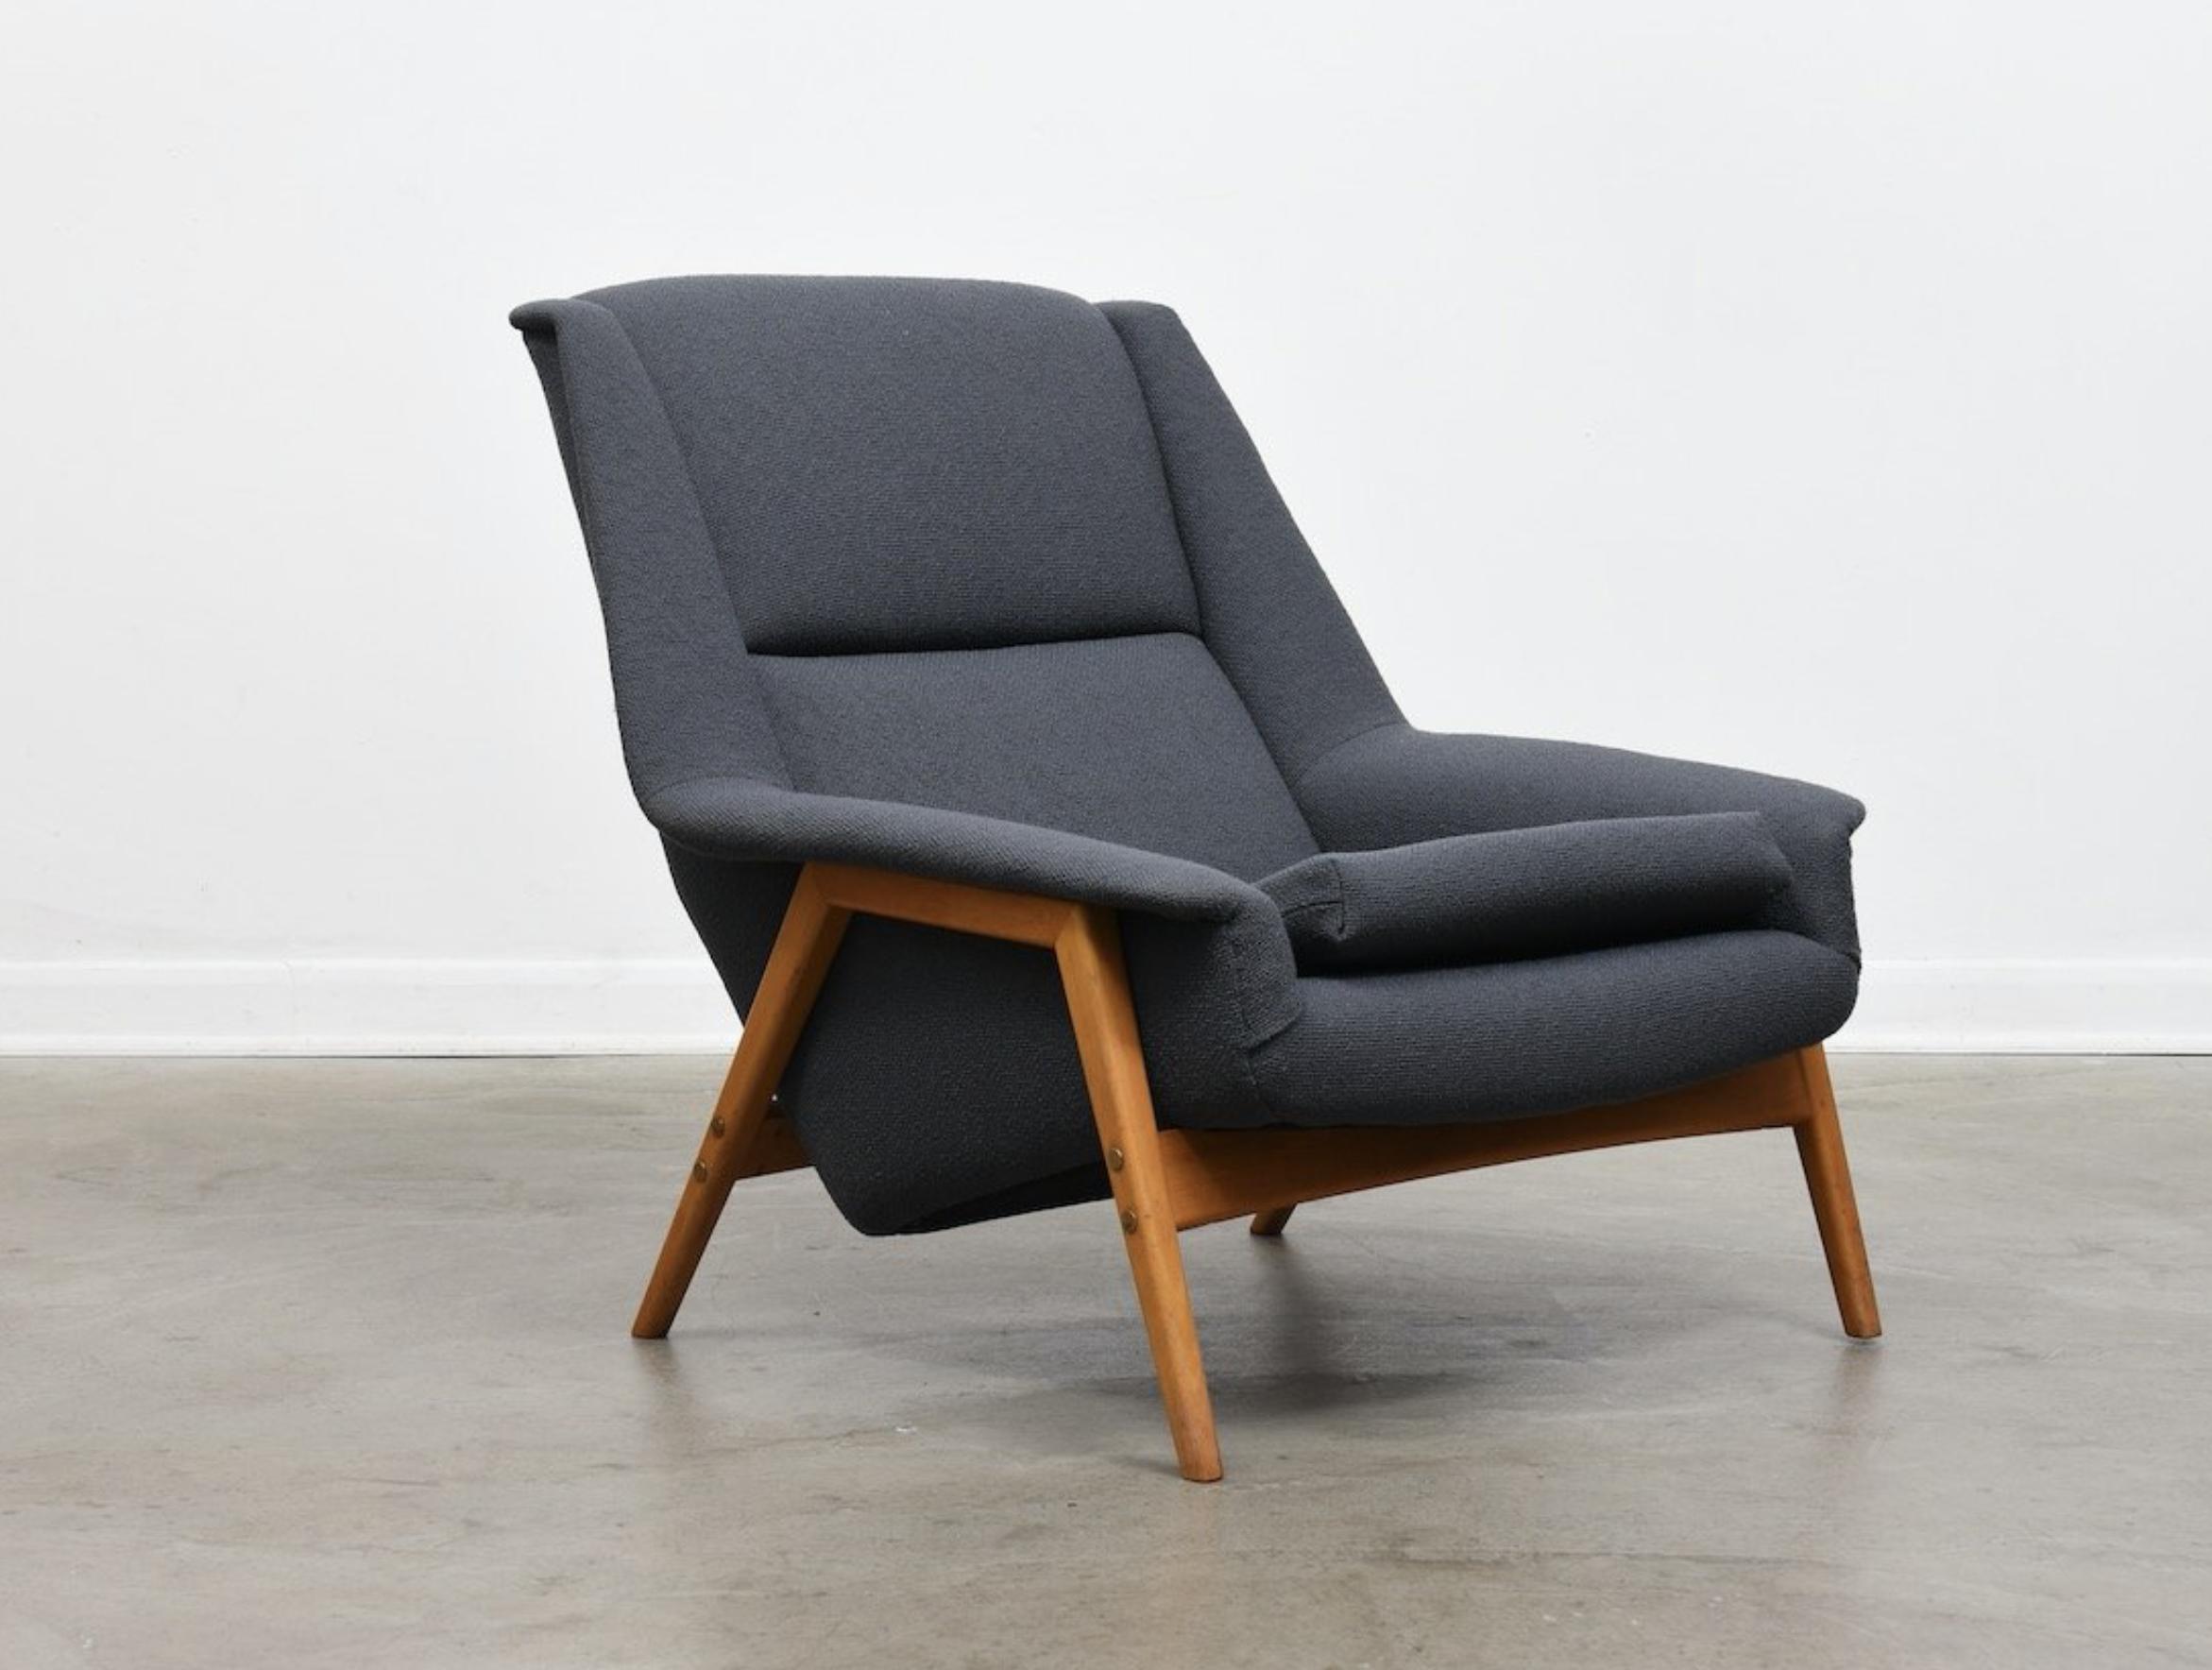 1960s Folke Ohlsson lounge chair for DUX, wool upholstery, fully restored, POA at Chase & Sorensen